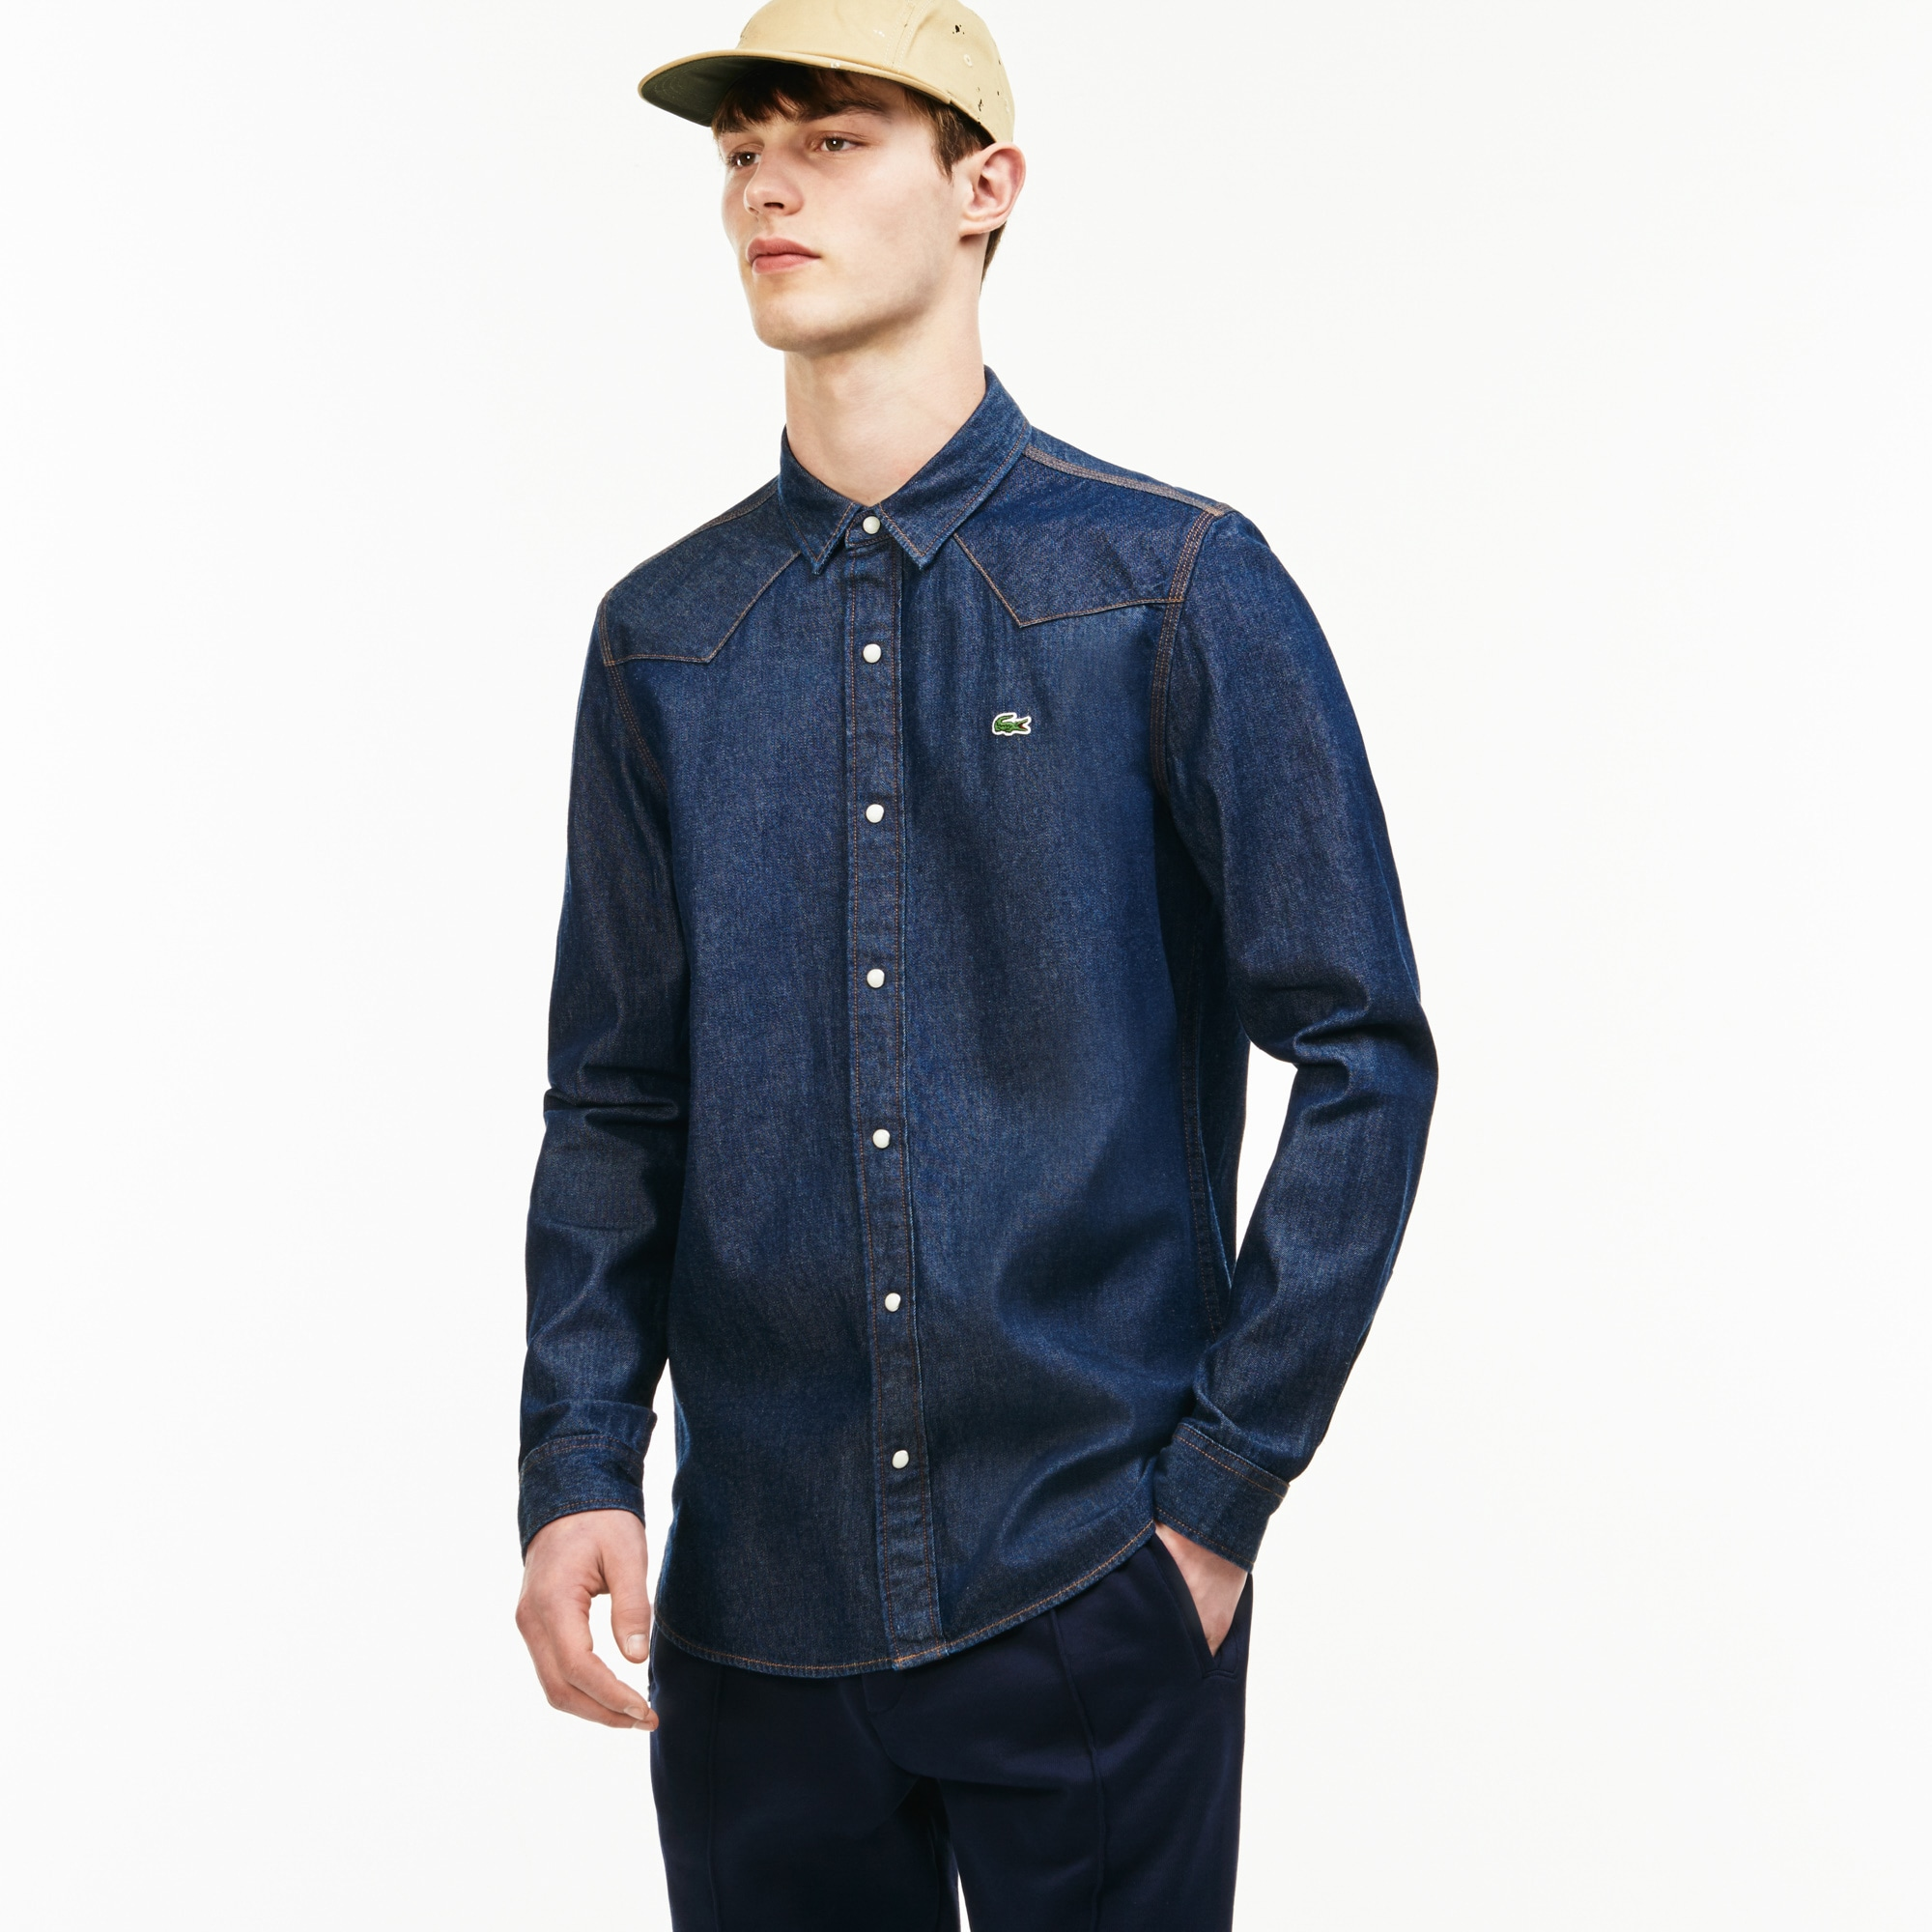 Men's Lacoste LIVE Skinny Fit Western Yoke Denim Shirt